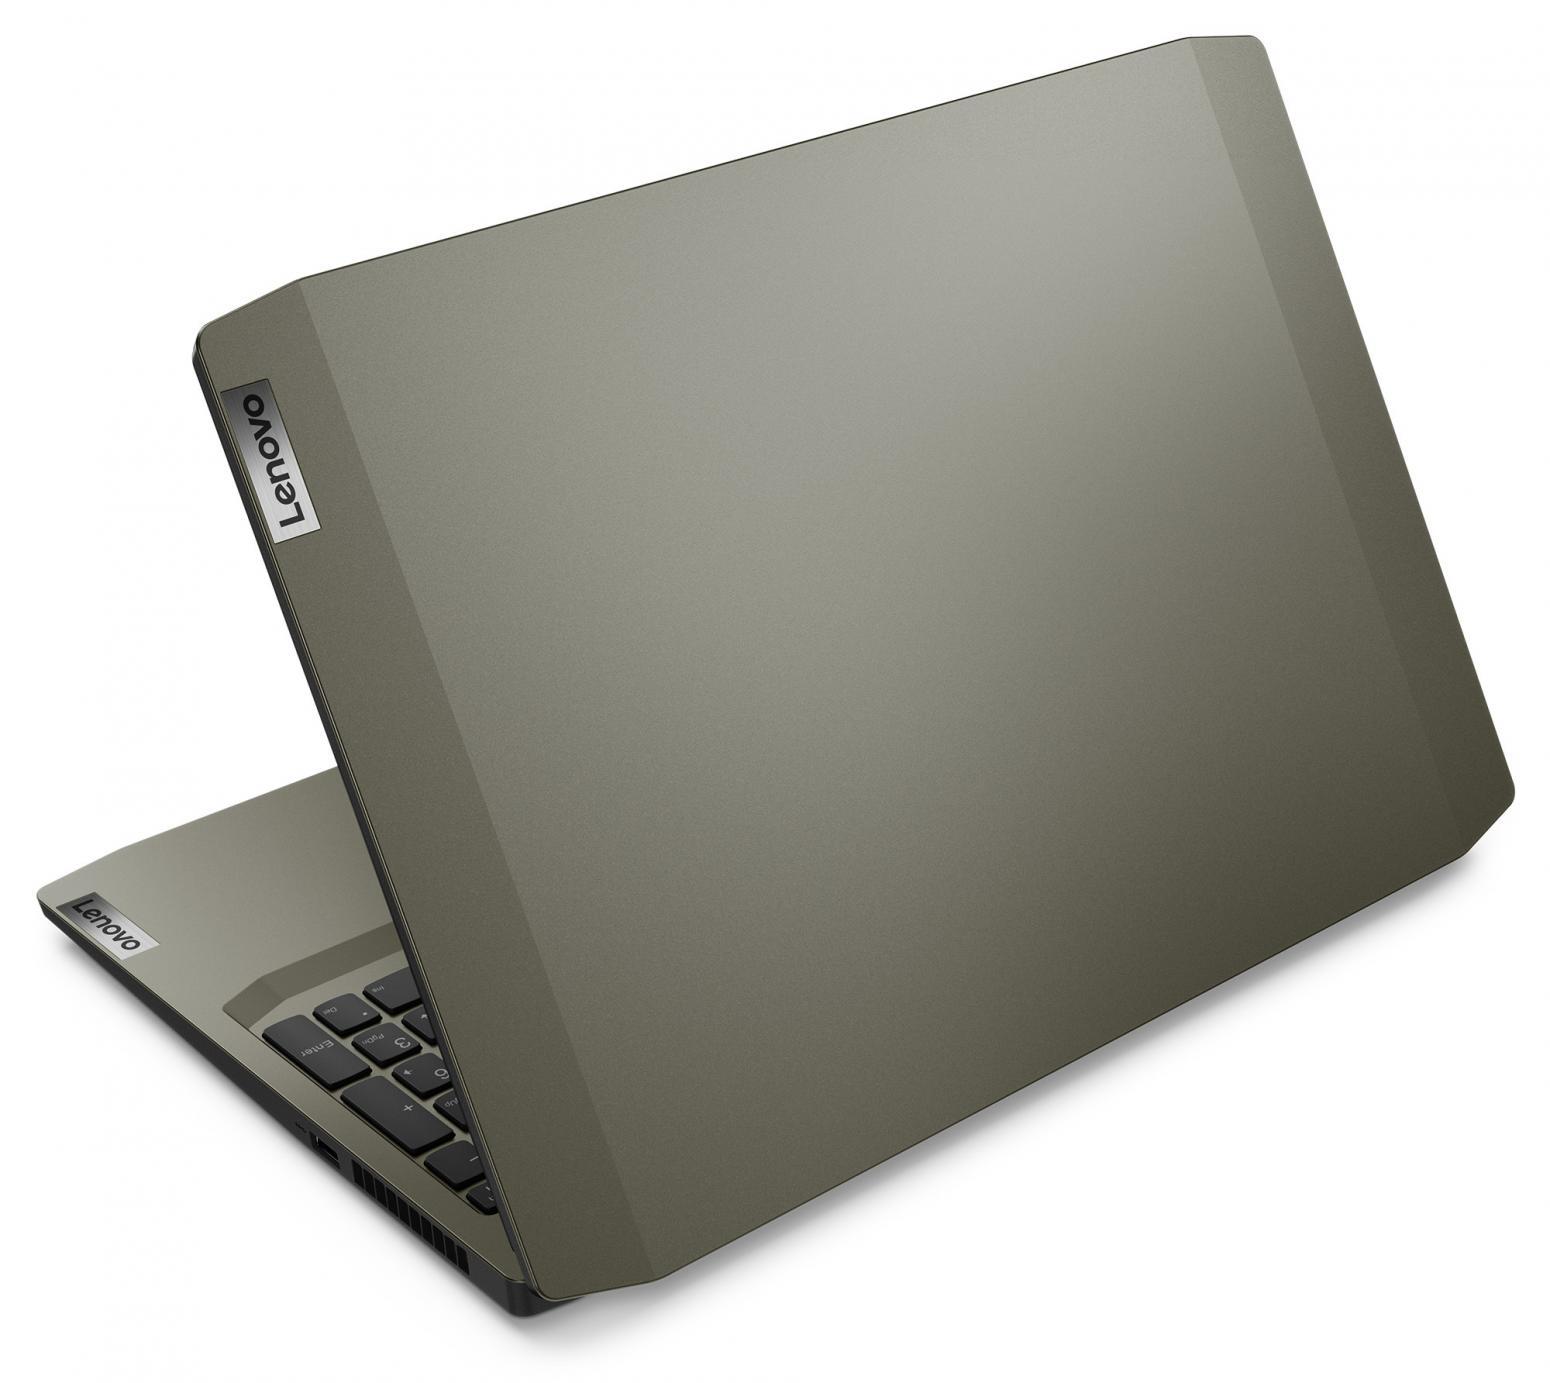 Ordinateur portable Lenovo  IdeaPad Creator 5 15IMH05 (82D4004WFR) Vert Kaki - GTX 1650 Ti, 144Hz - photo 7